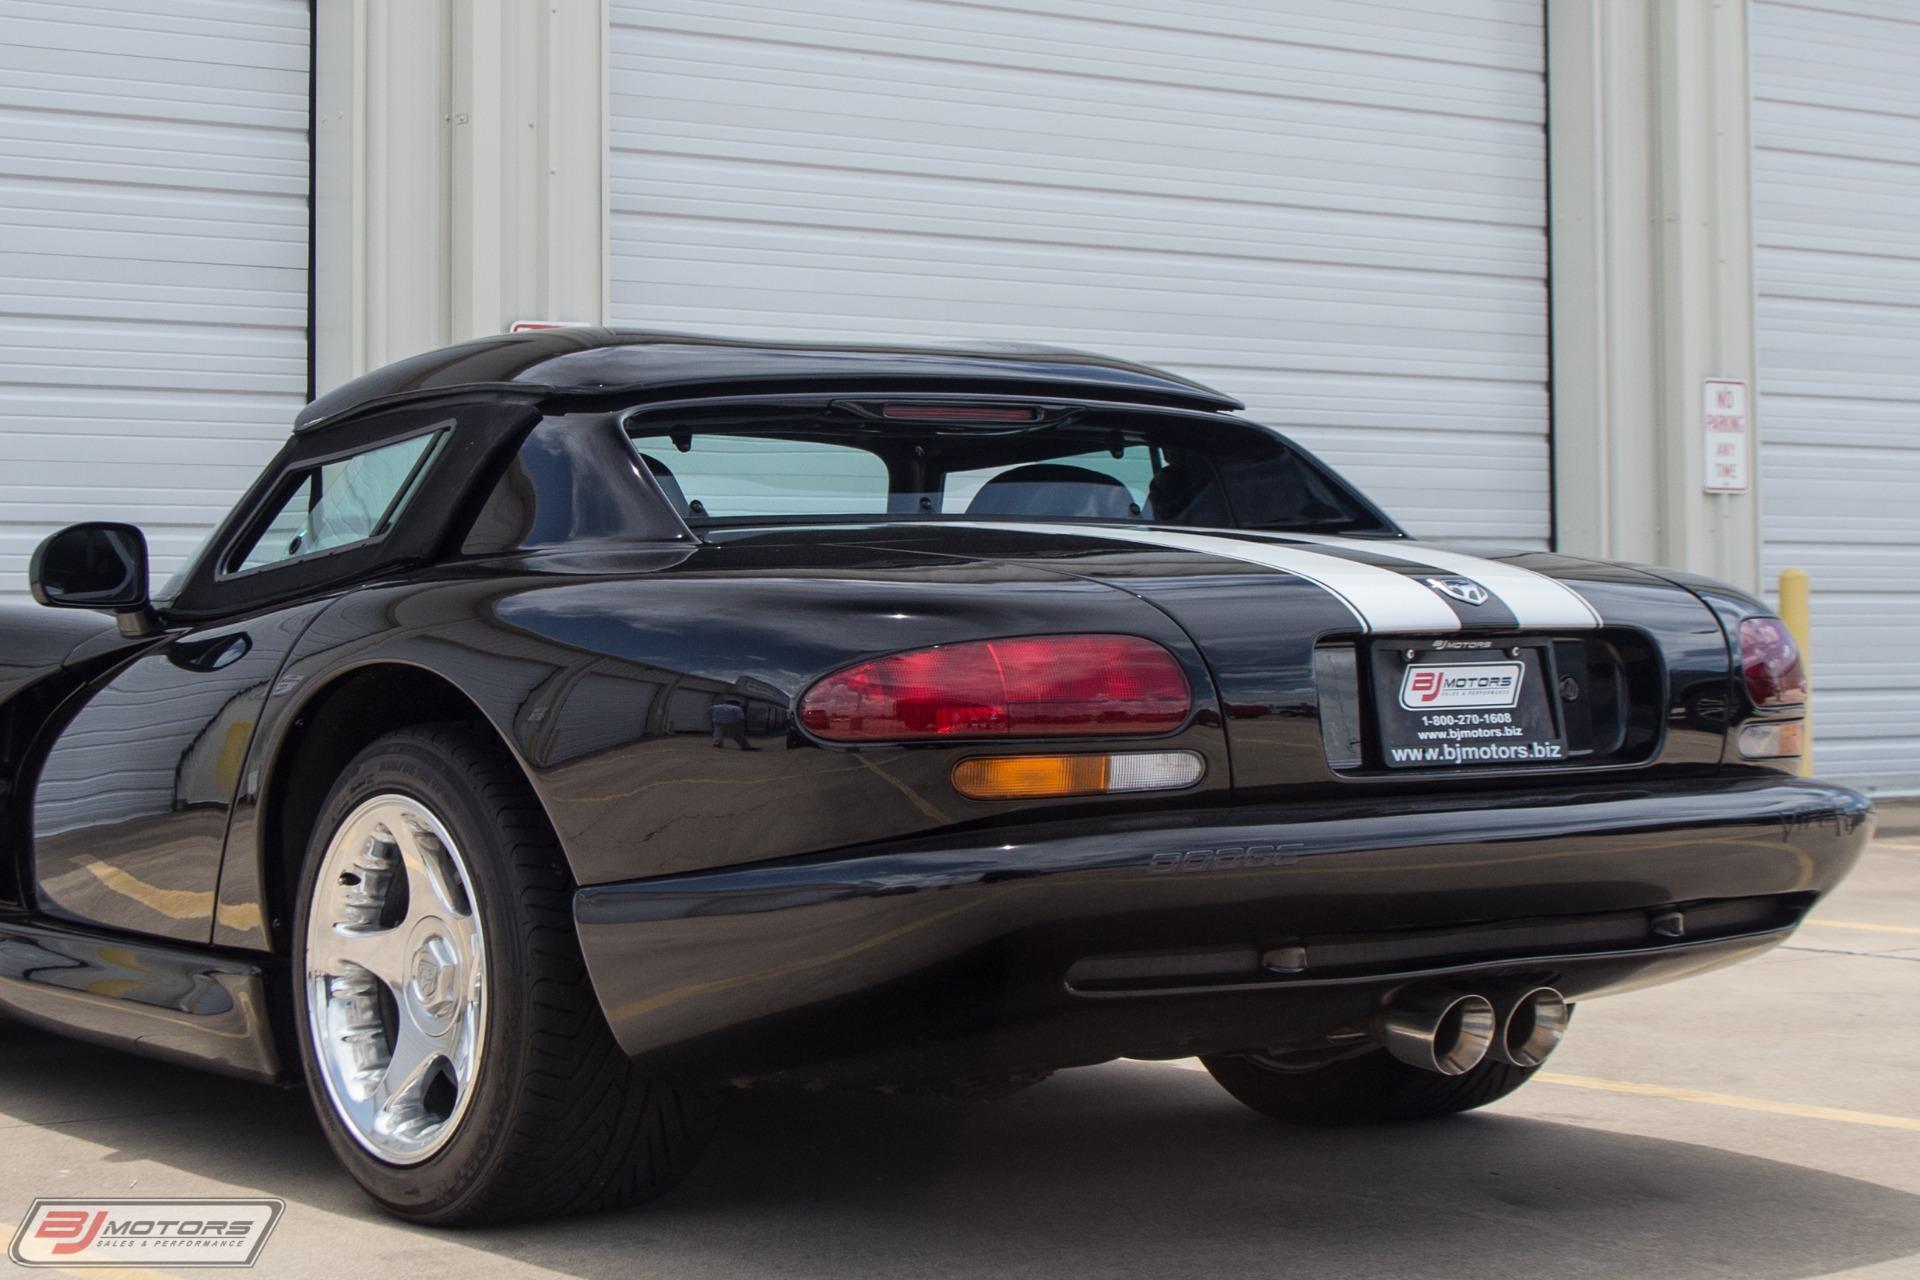 Used-1996-Dodge-Viper-RT/10